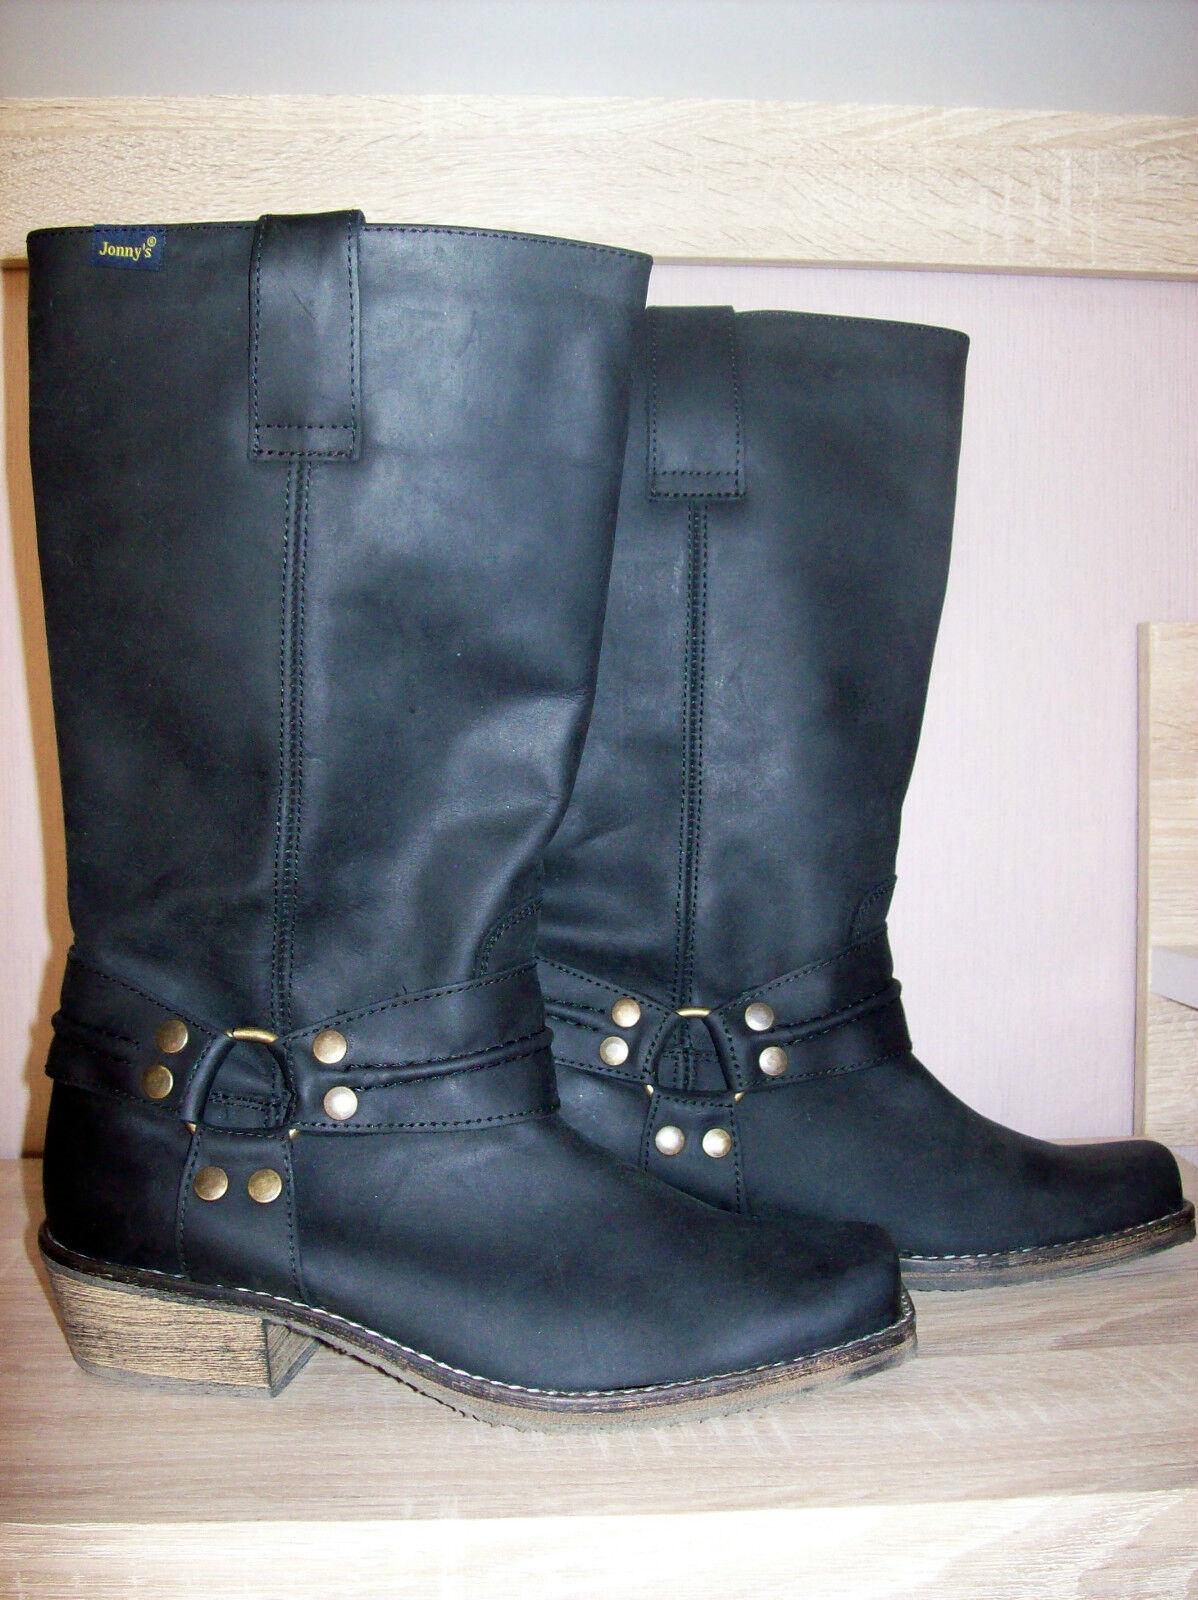 Jonny's sehr schöne schwarze Stiefel Neu NP: